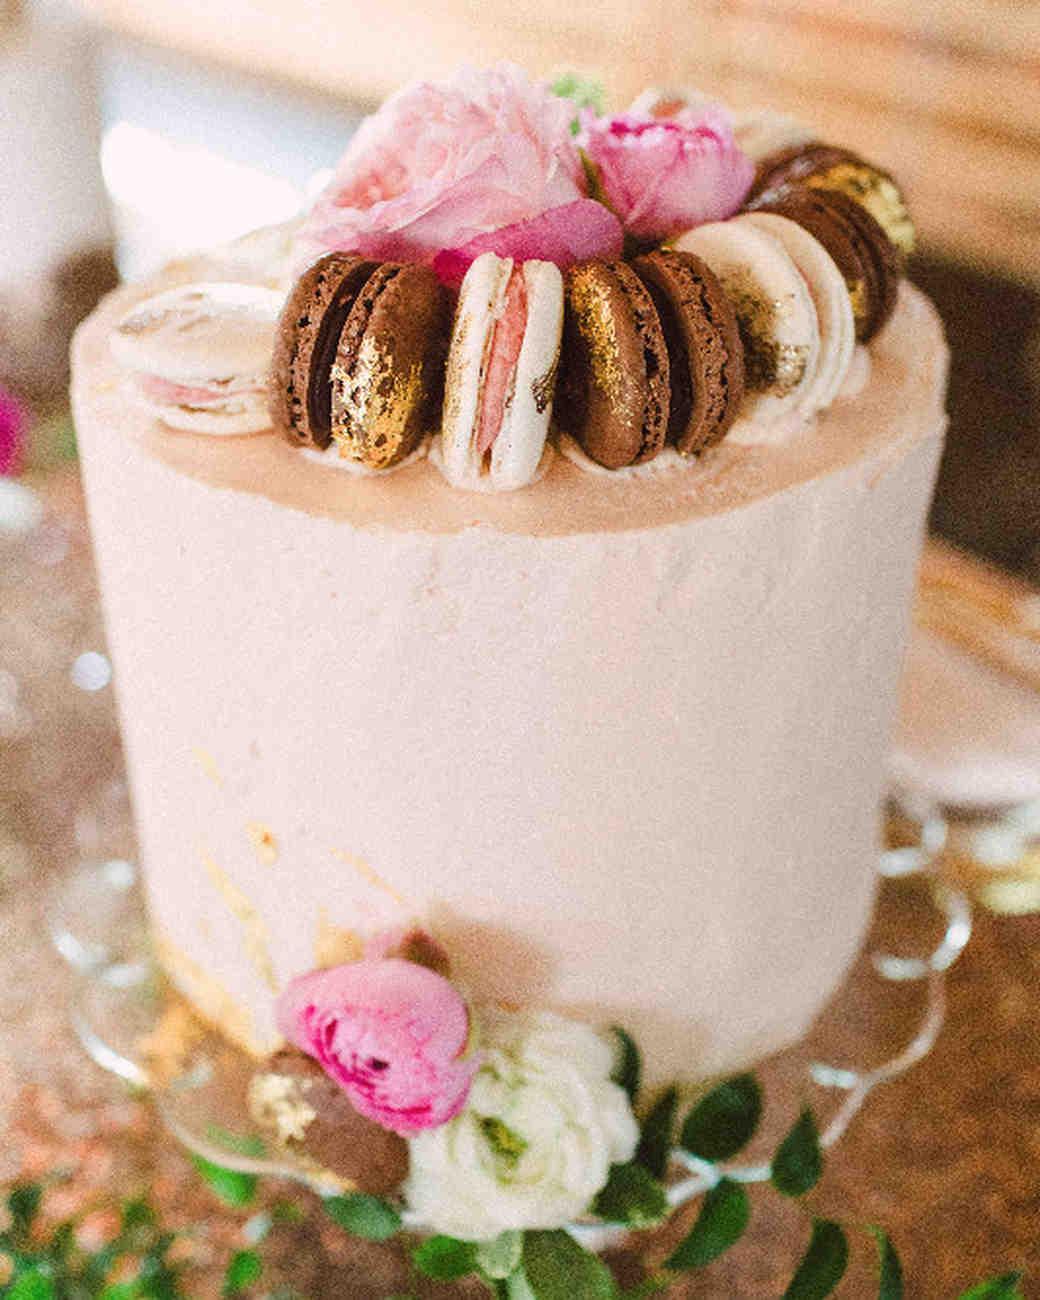 wedding cake topped with macarons